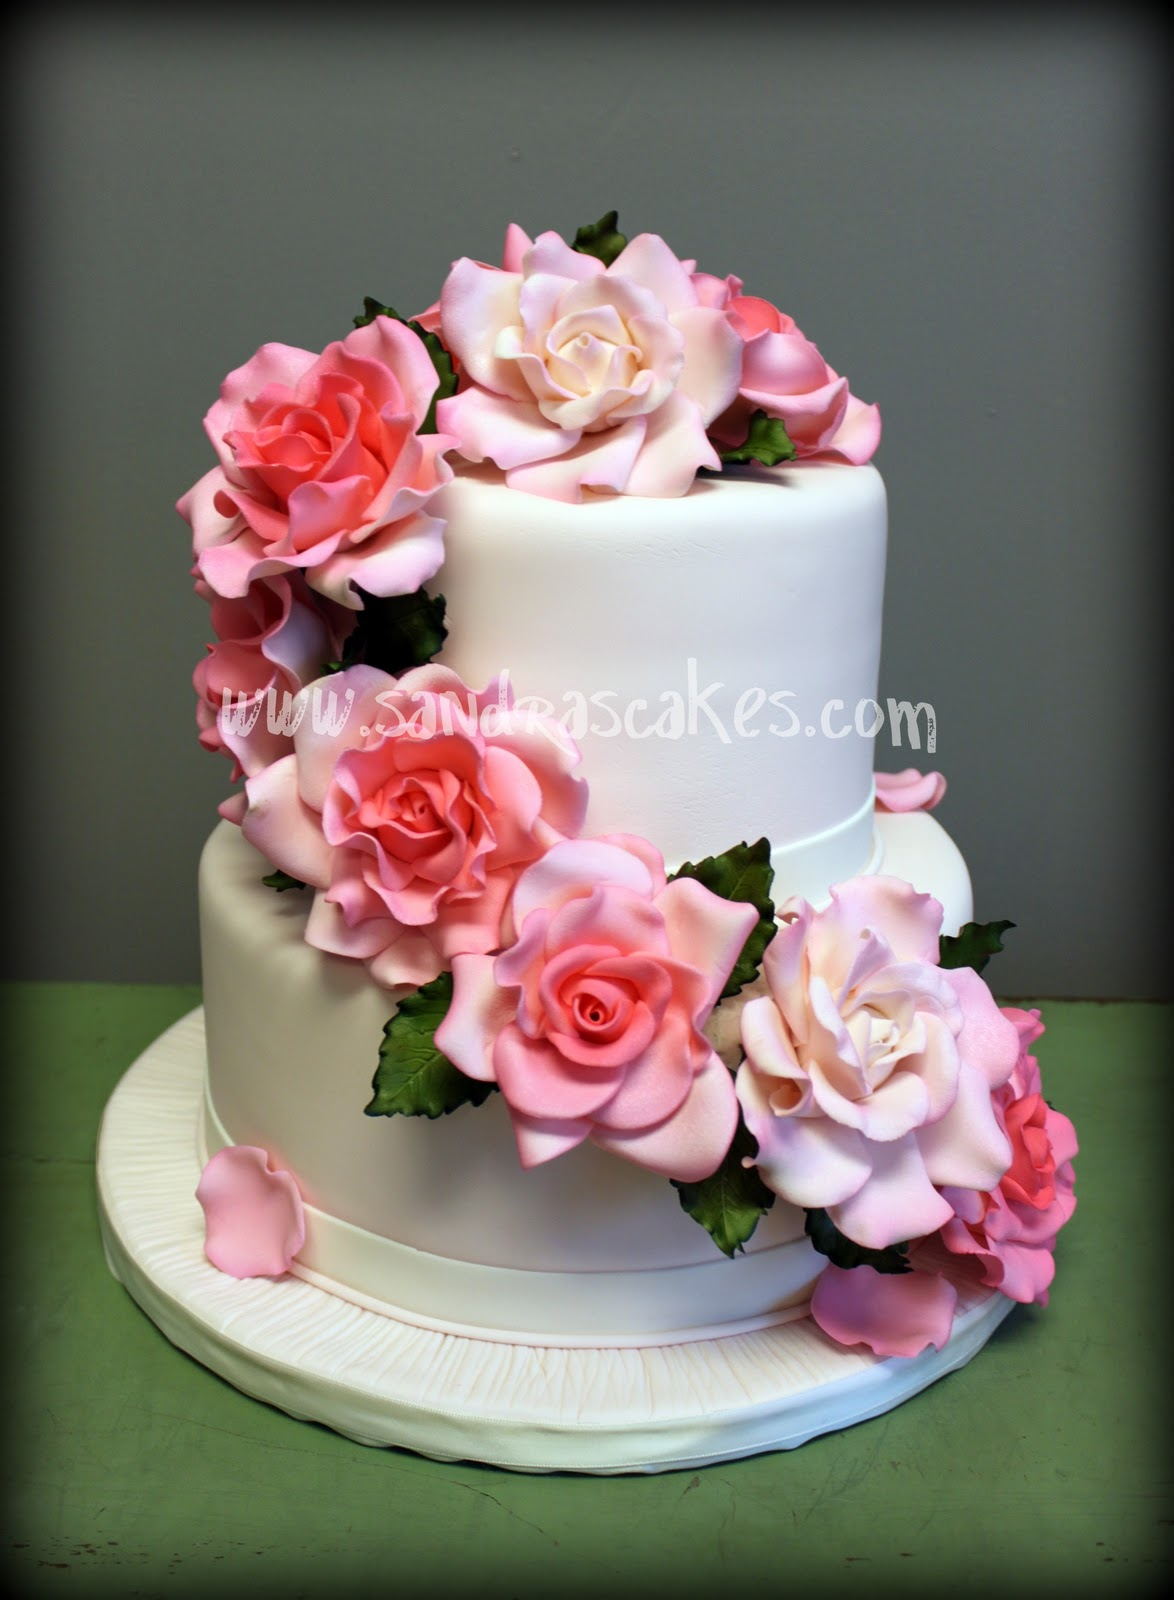 Latest Birthday Cake Images Download : On Birthday Cakes: Latest Fabulous Wedding Cakes